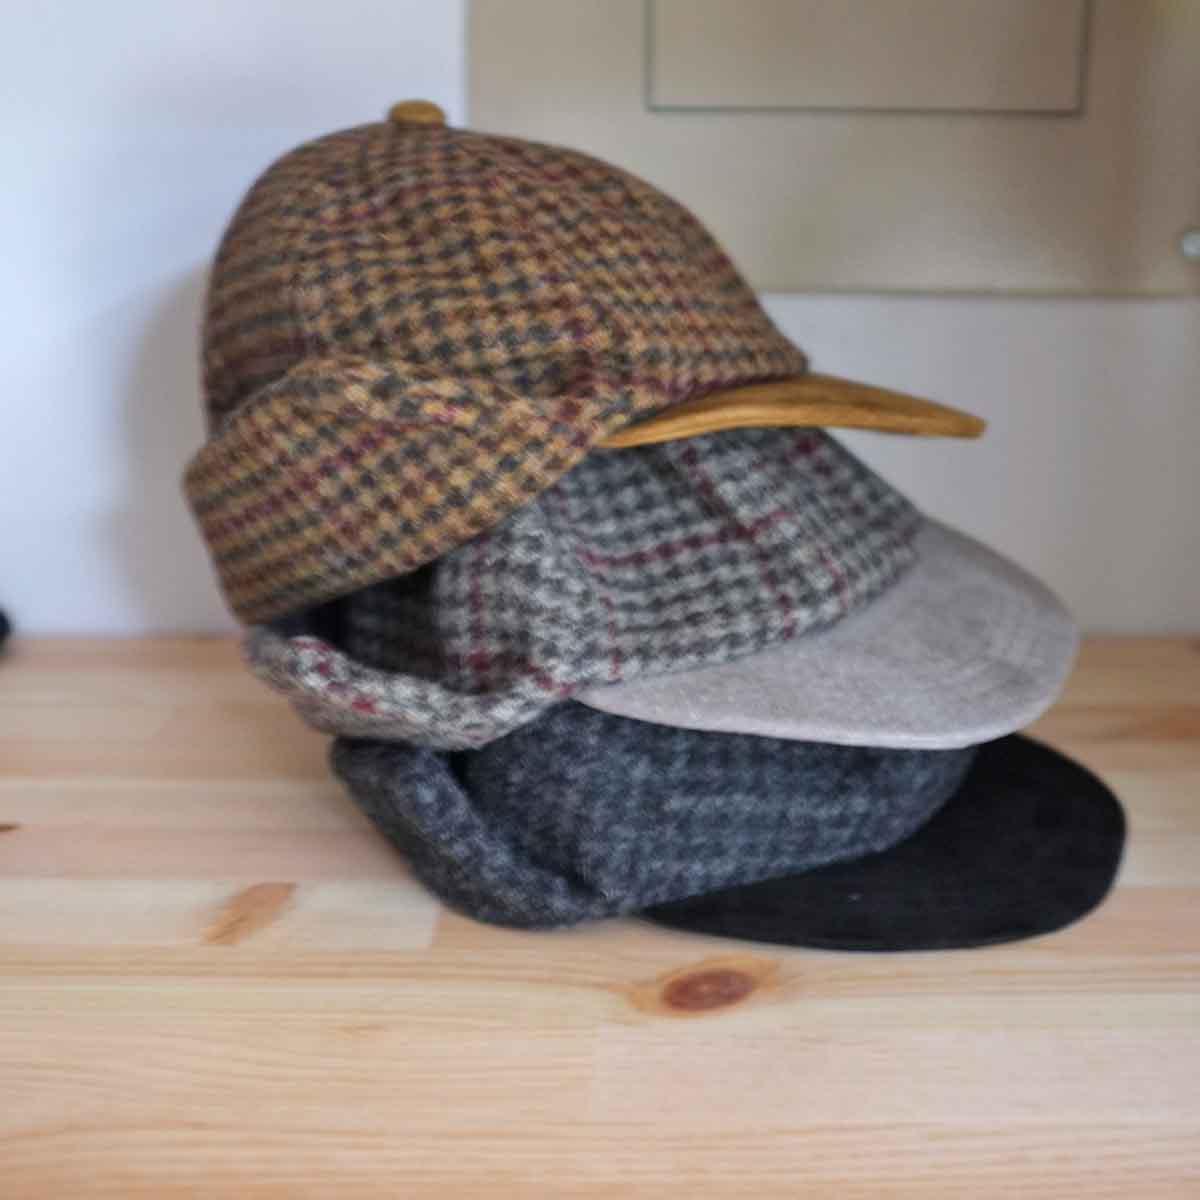 Hender Scheme エンダースキーマ tweed ear cap ツイードイヤーキャップ 3 colors